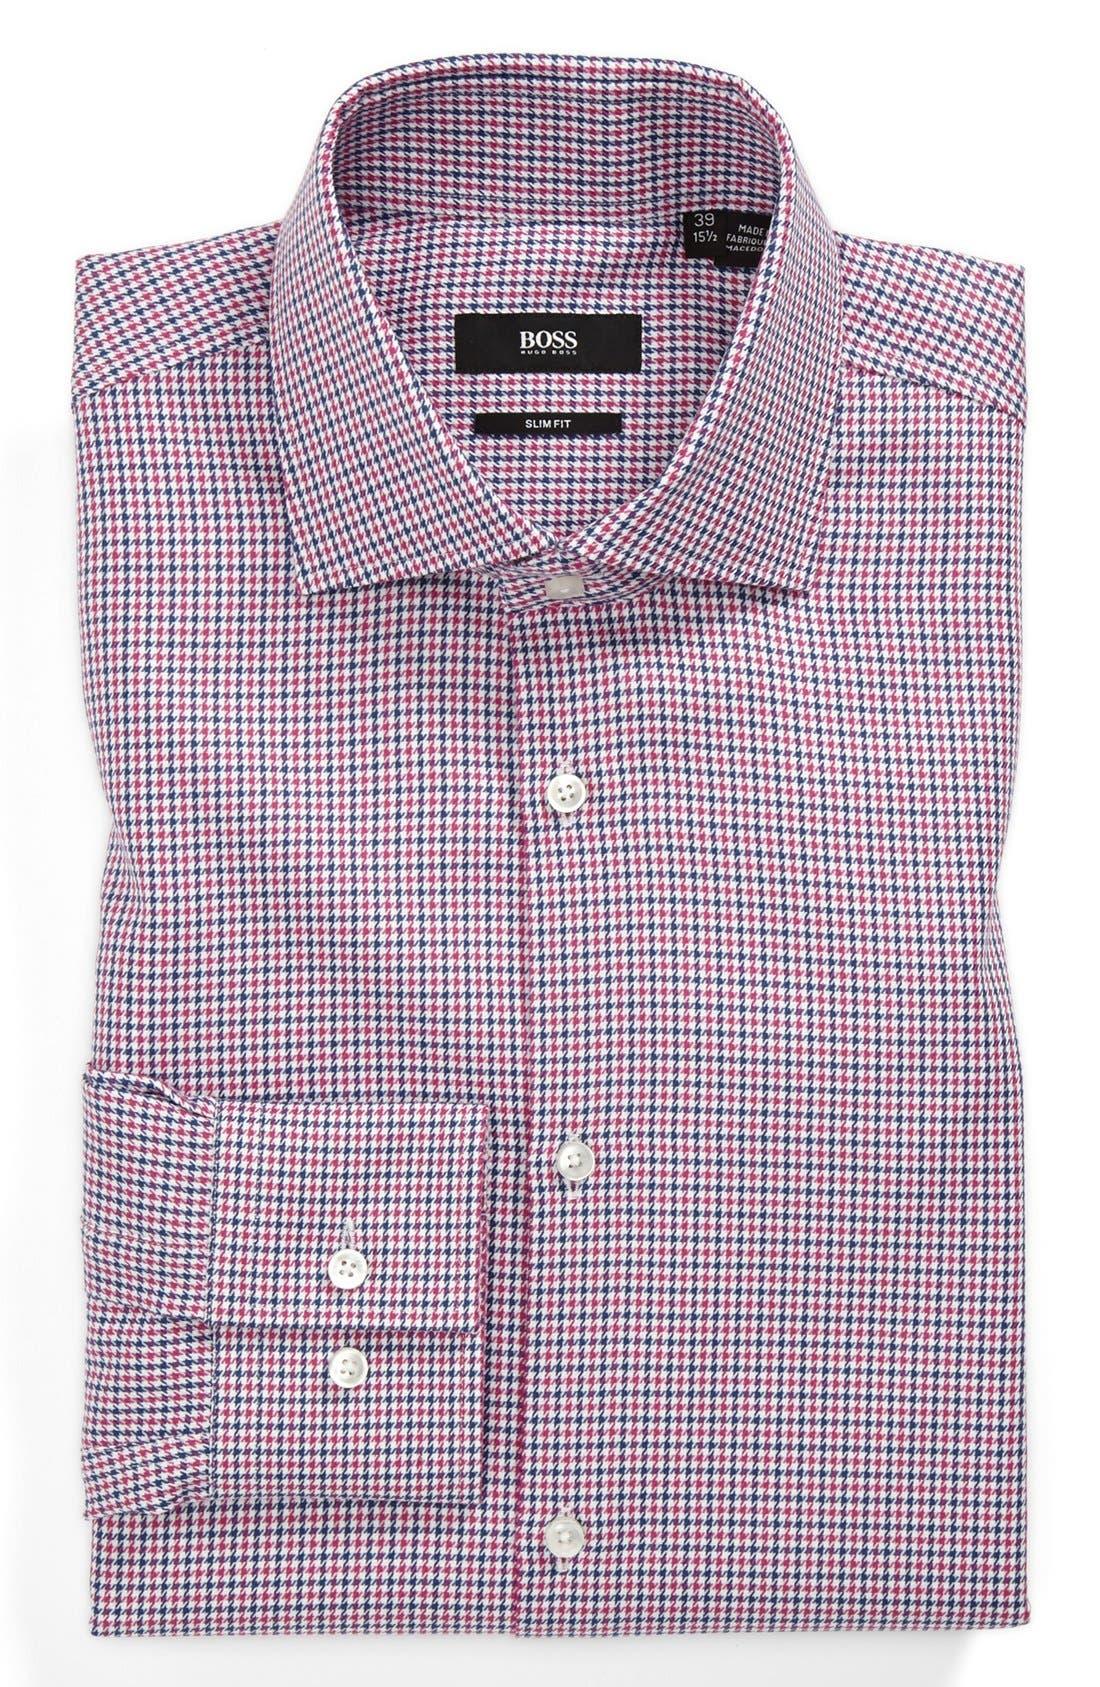 Alternate Image 1 Selected - BOSS HUGO BOSS 'Jaron' Slim Fit Dress Shirt